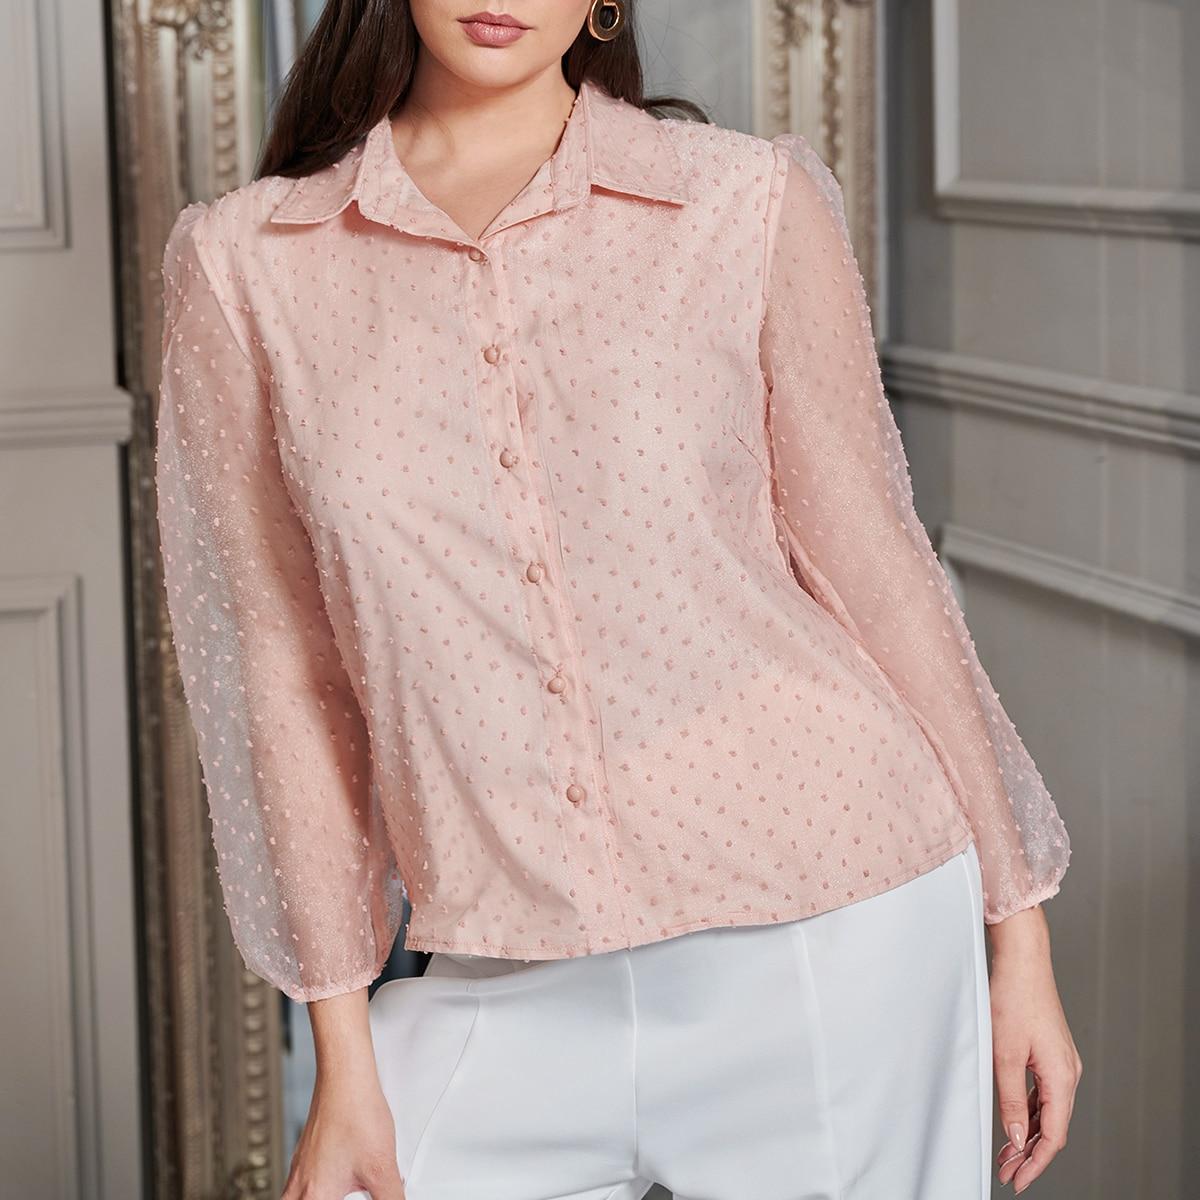 Сетчатая блузка размера плюс